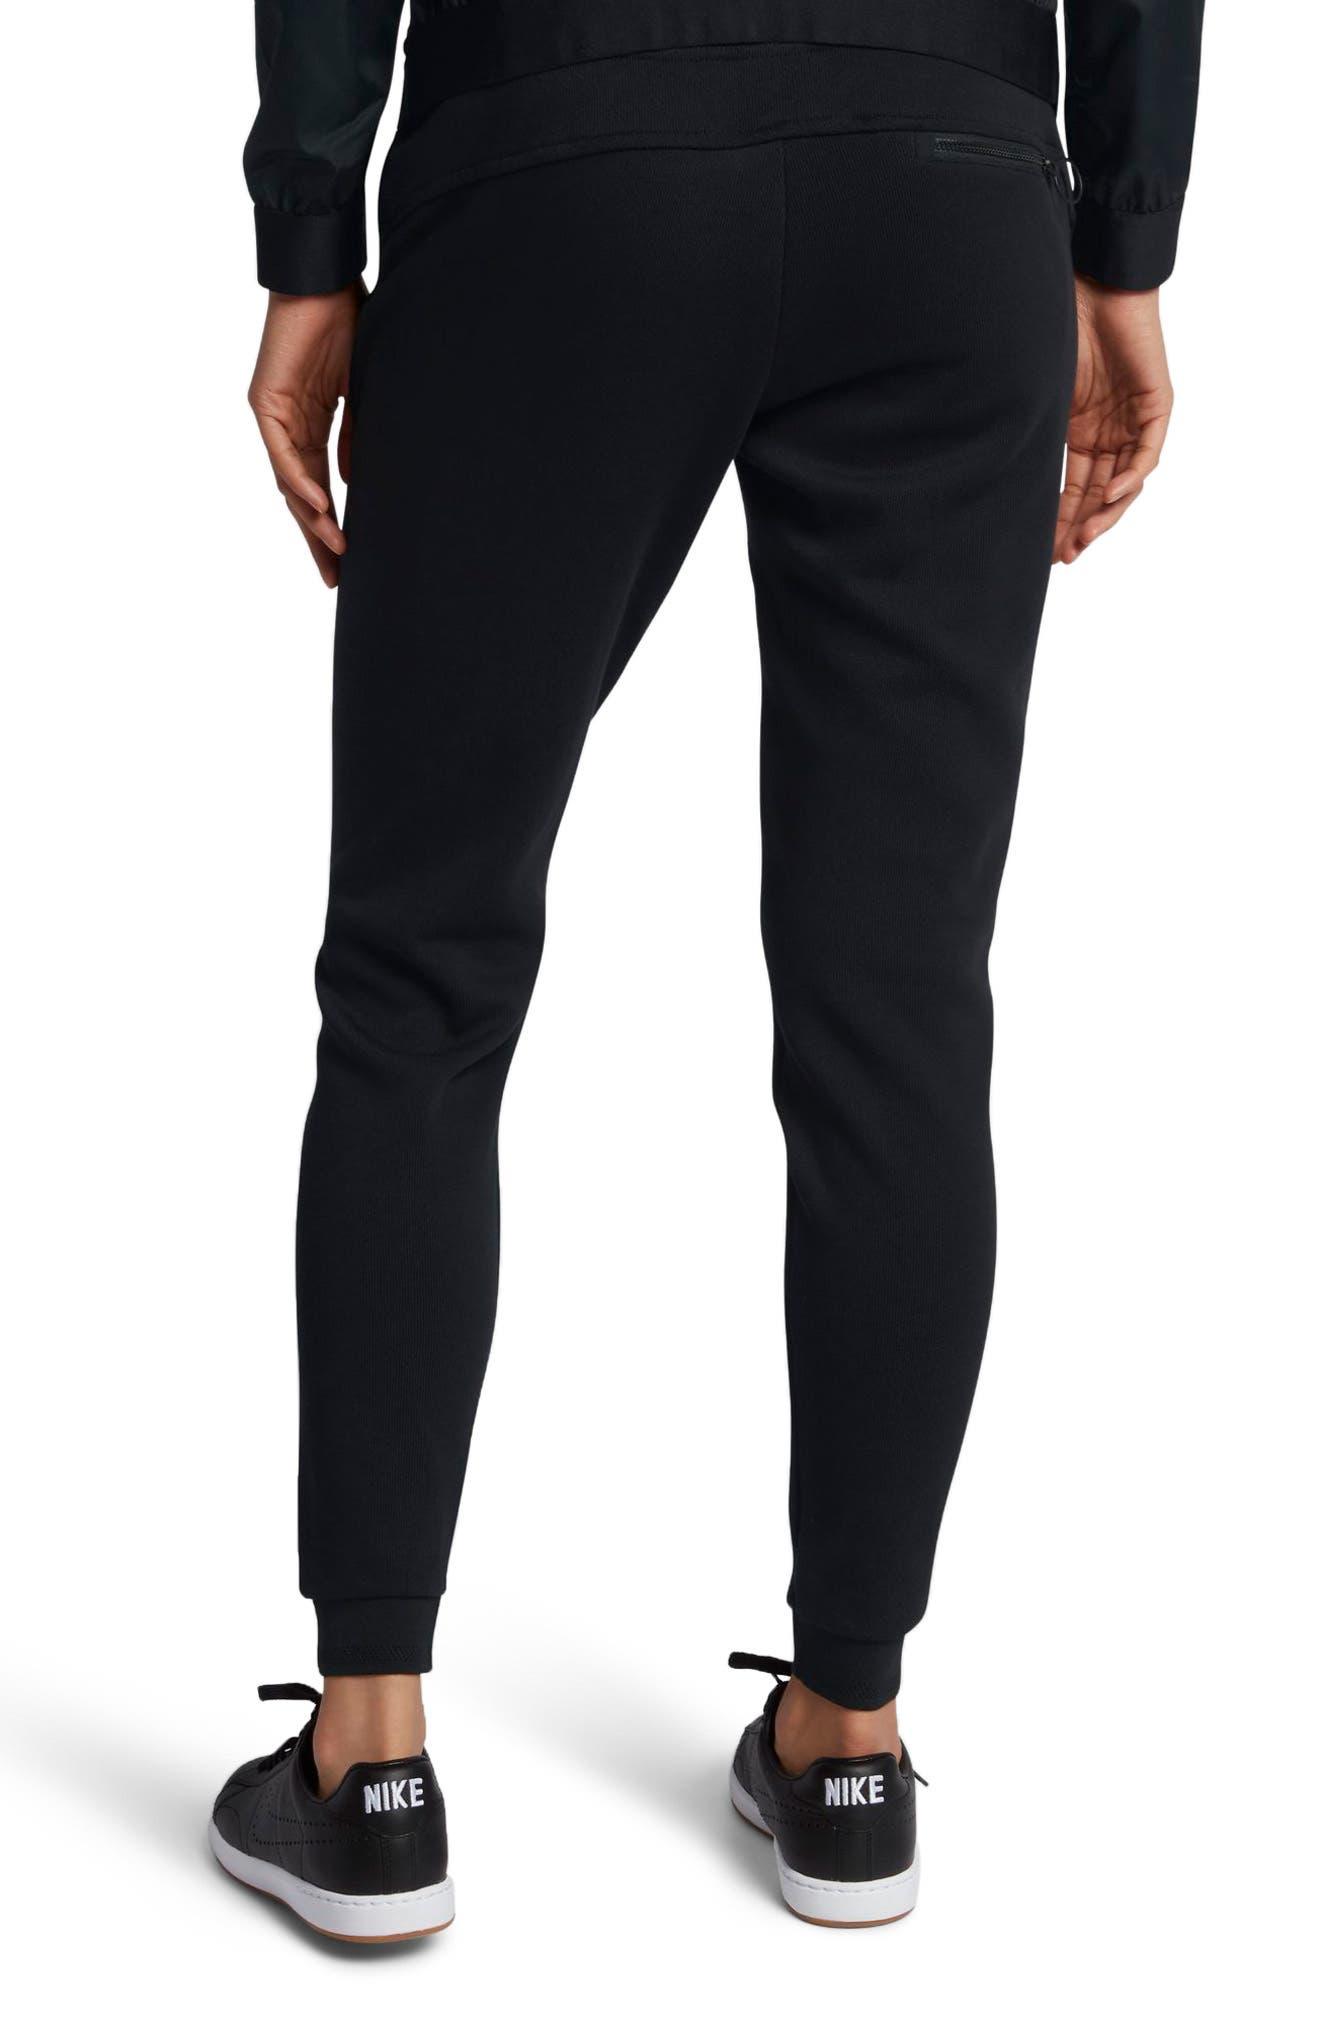 Women's Court Tennis Pants,                             Alternate thumbnail 2, color,                             Black/ Hot Punch/ White